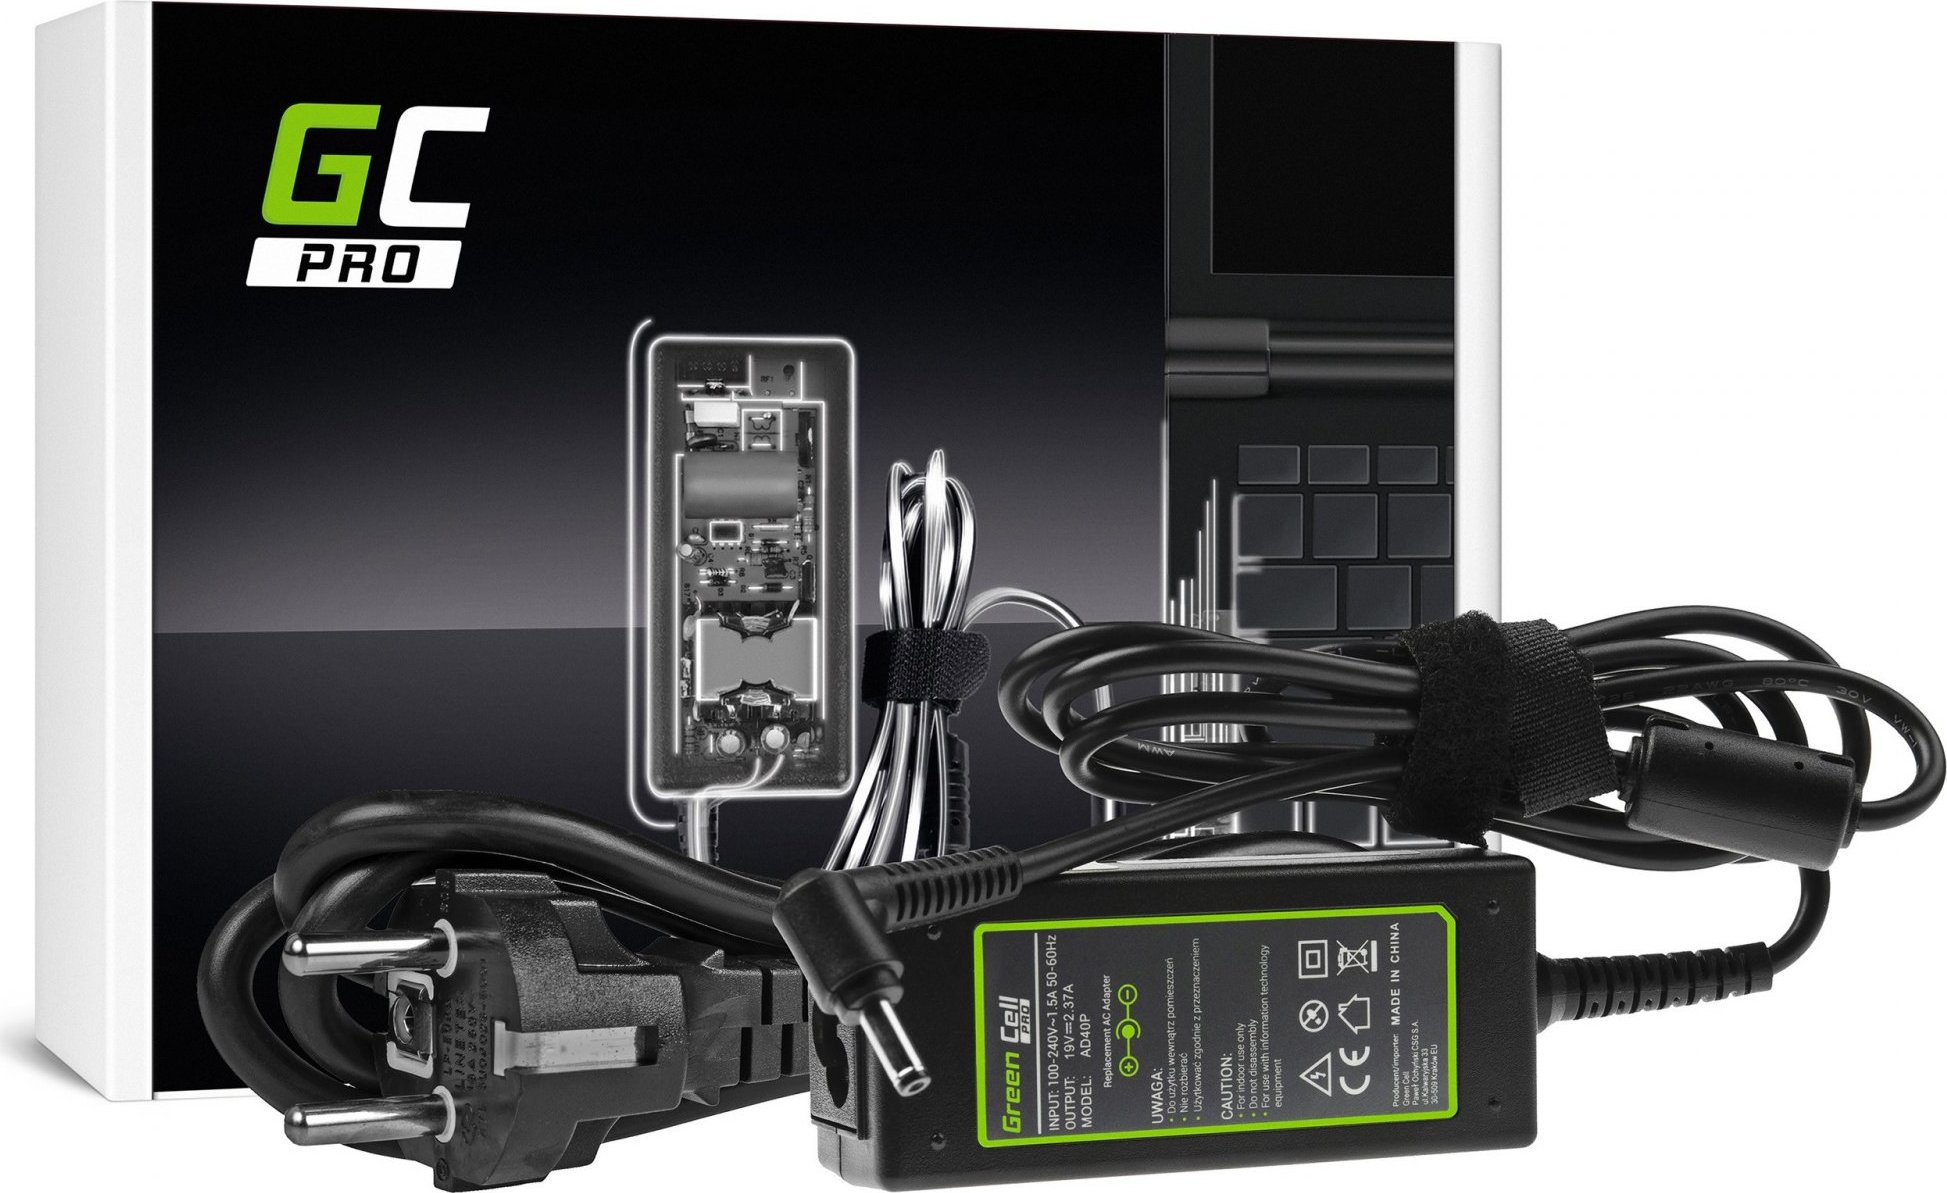 Nabíjačka na notebook Asus F201E, Asus VivoBook Q200, Asus VivoBook Q200E, Asus VivoBook S200 19V 2.37A 45W